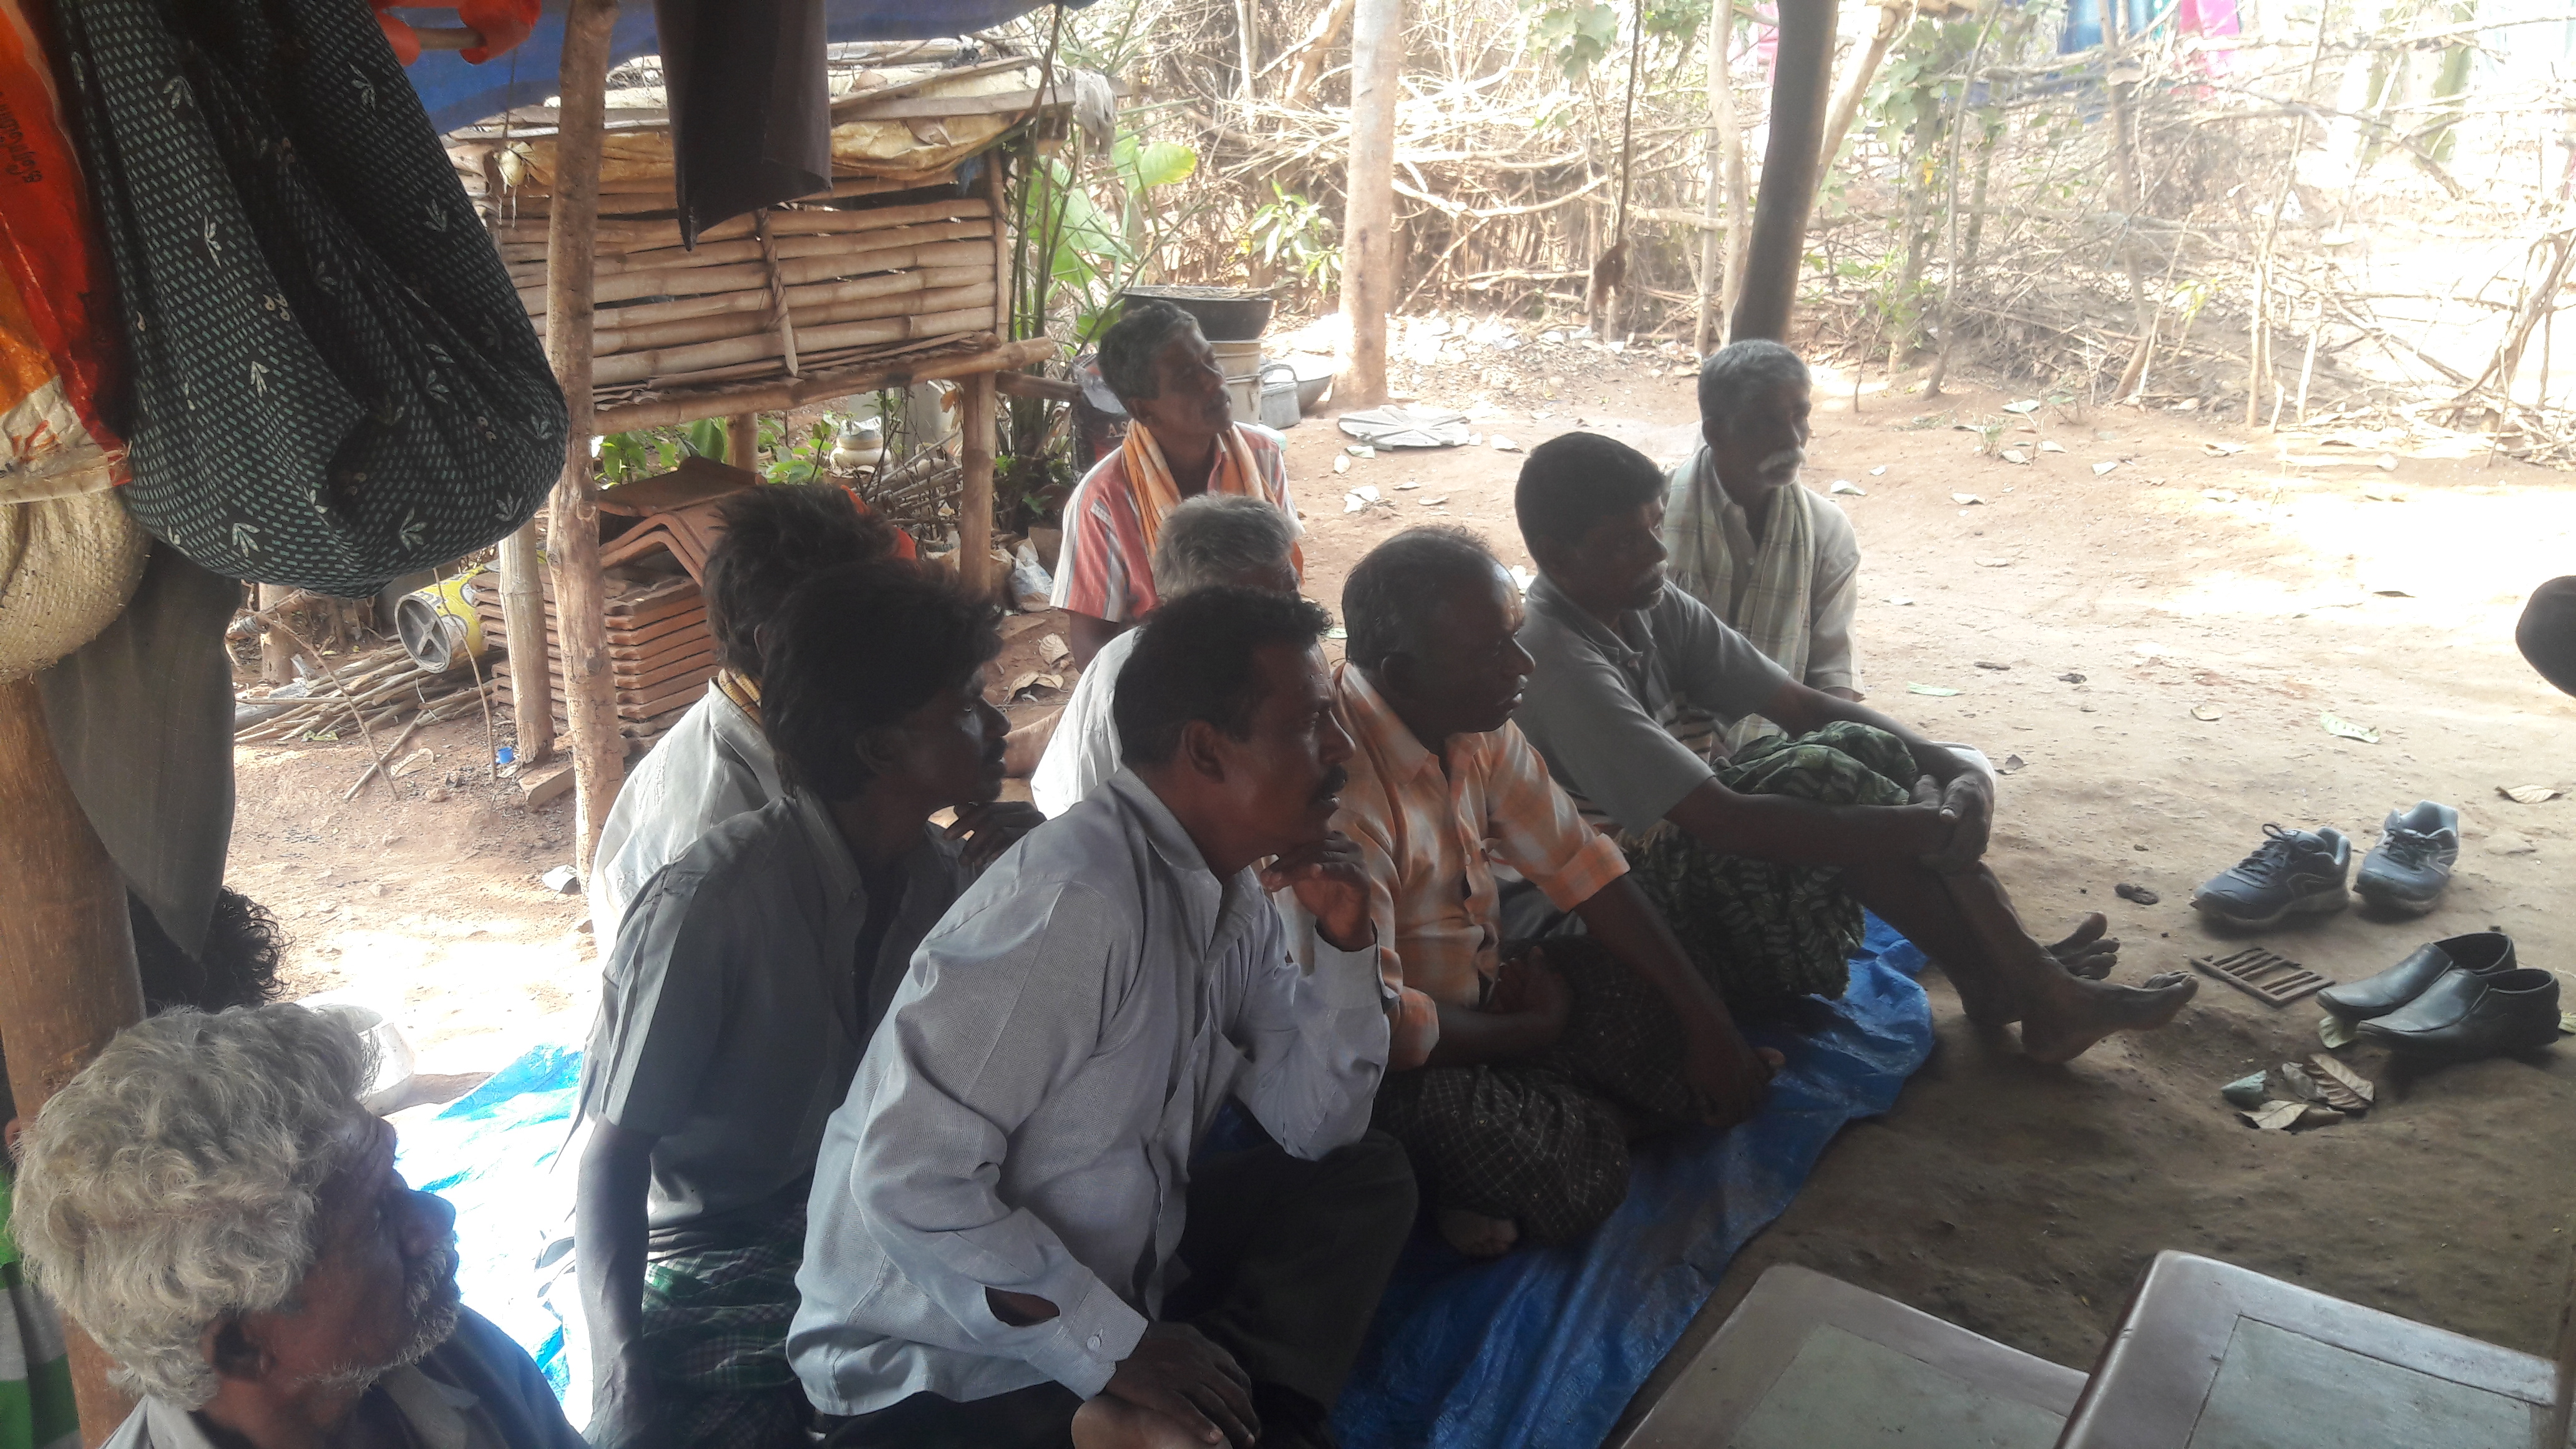 Farmers listening to tips on farming